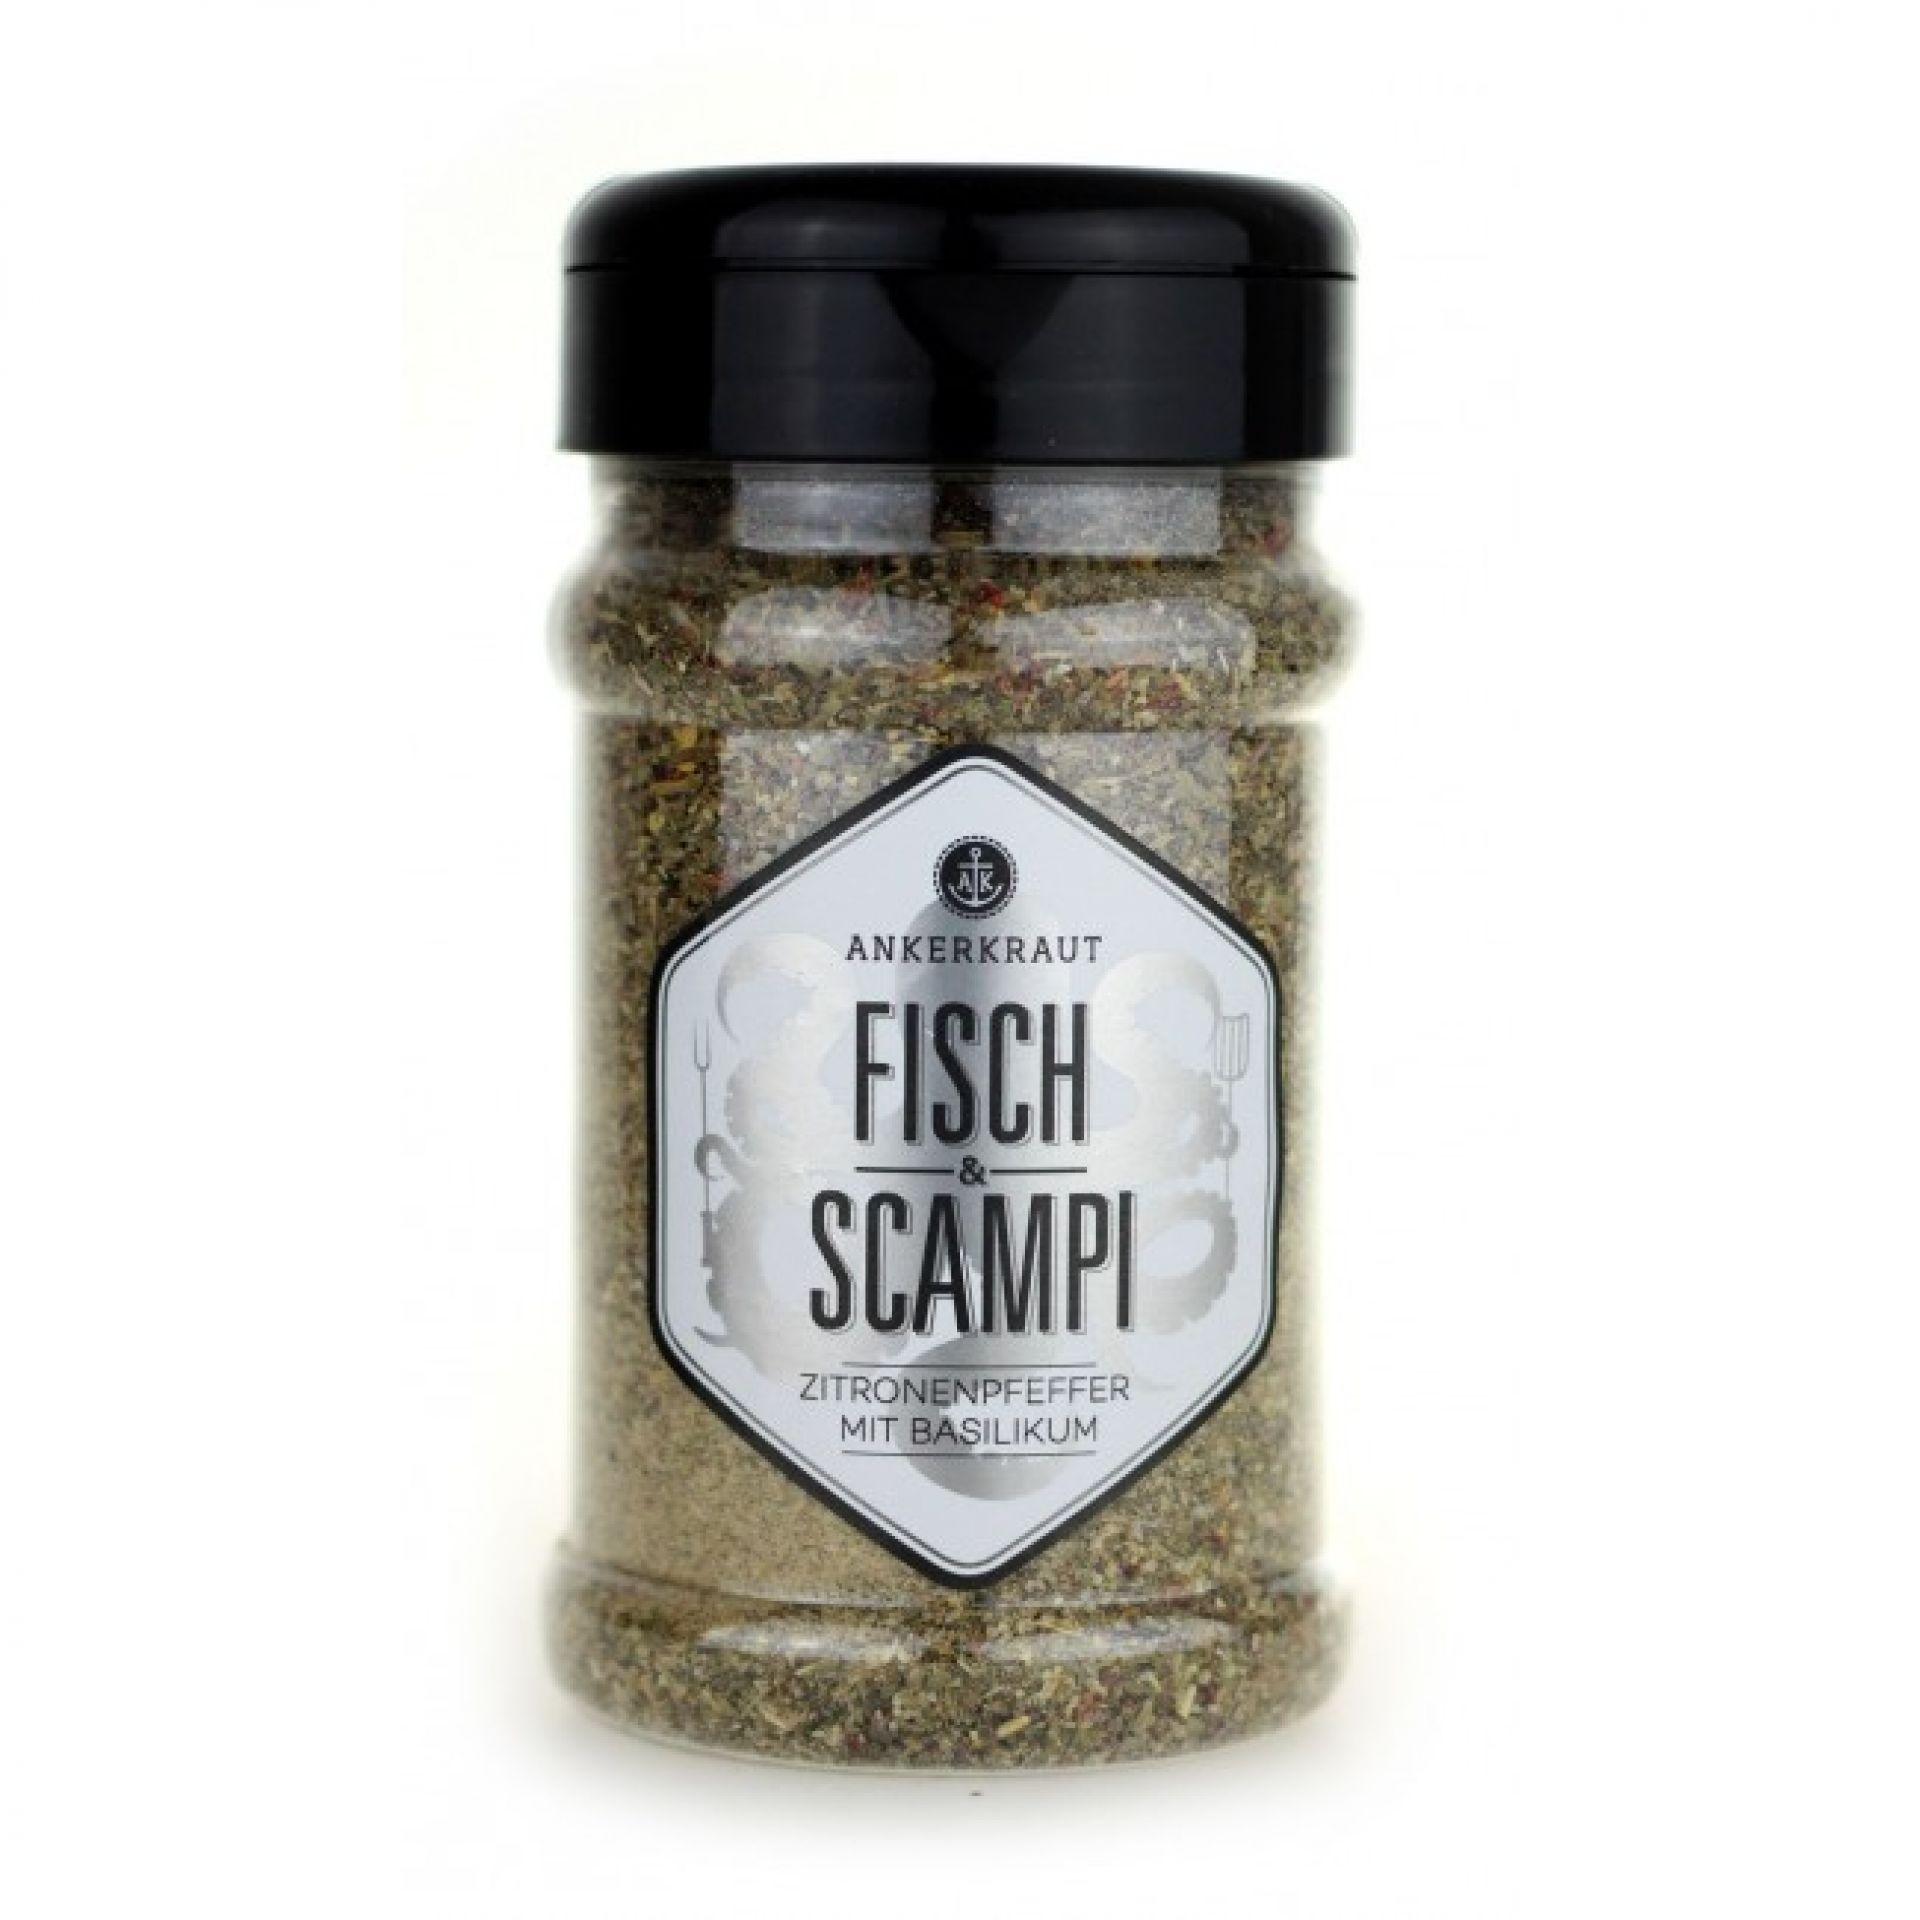 Ankerkraut Fisch & Scampi (Streuer) 150 g